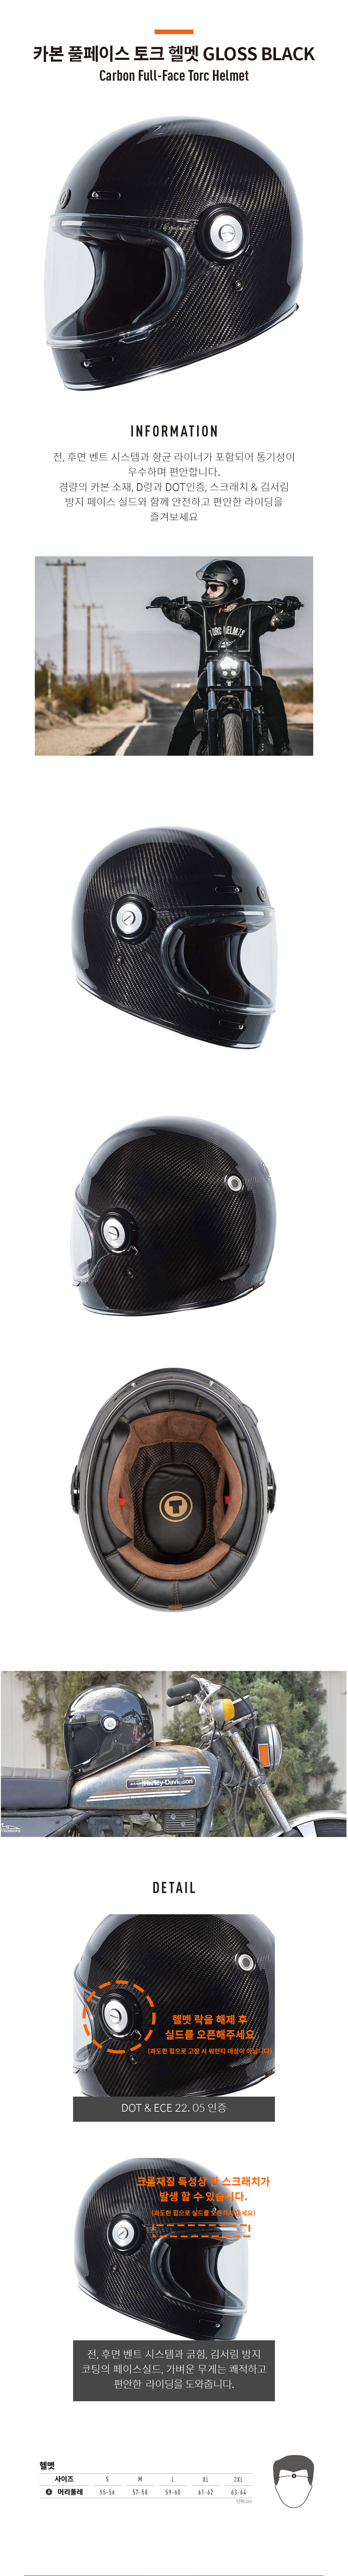 Torc 카본 풀페이스 토크 헬멧 GLOSS BLACK